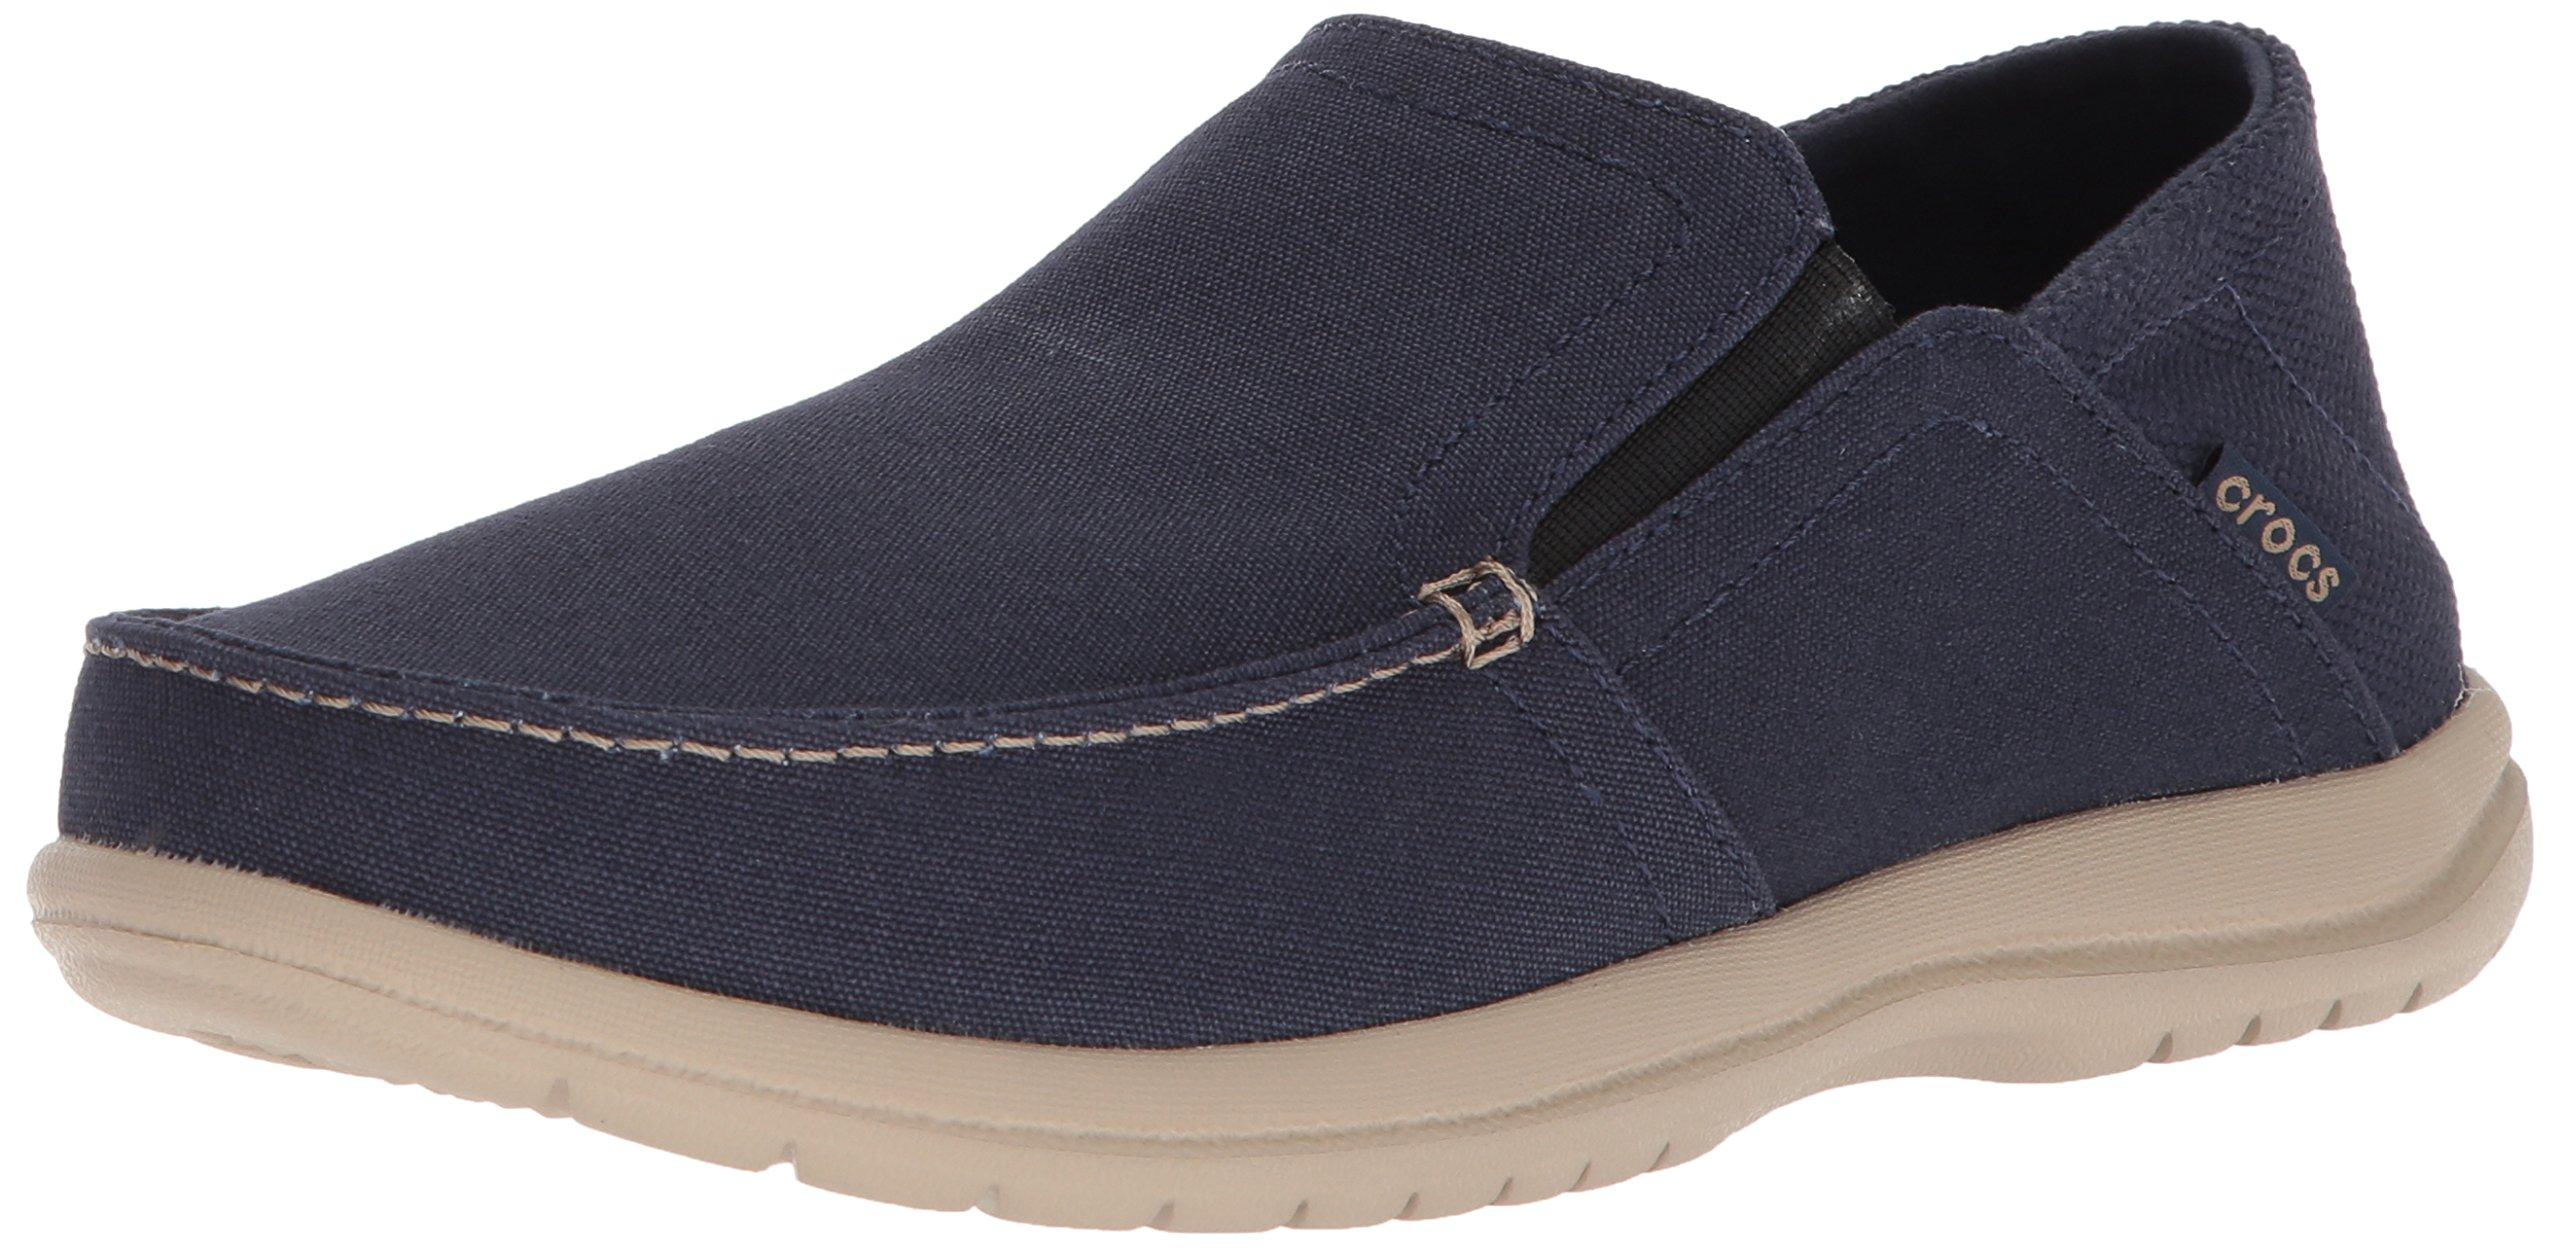 Crocs Men's Santa Cruz Convertible Slip-on Loafer, Navy/Cobblestone, 10 M US